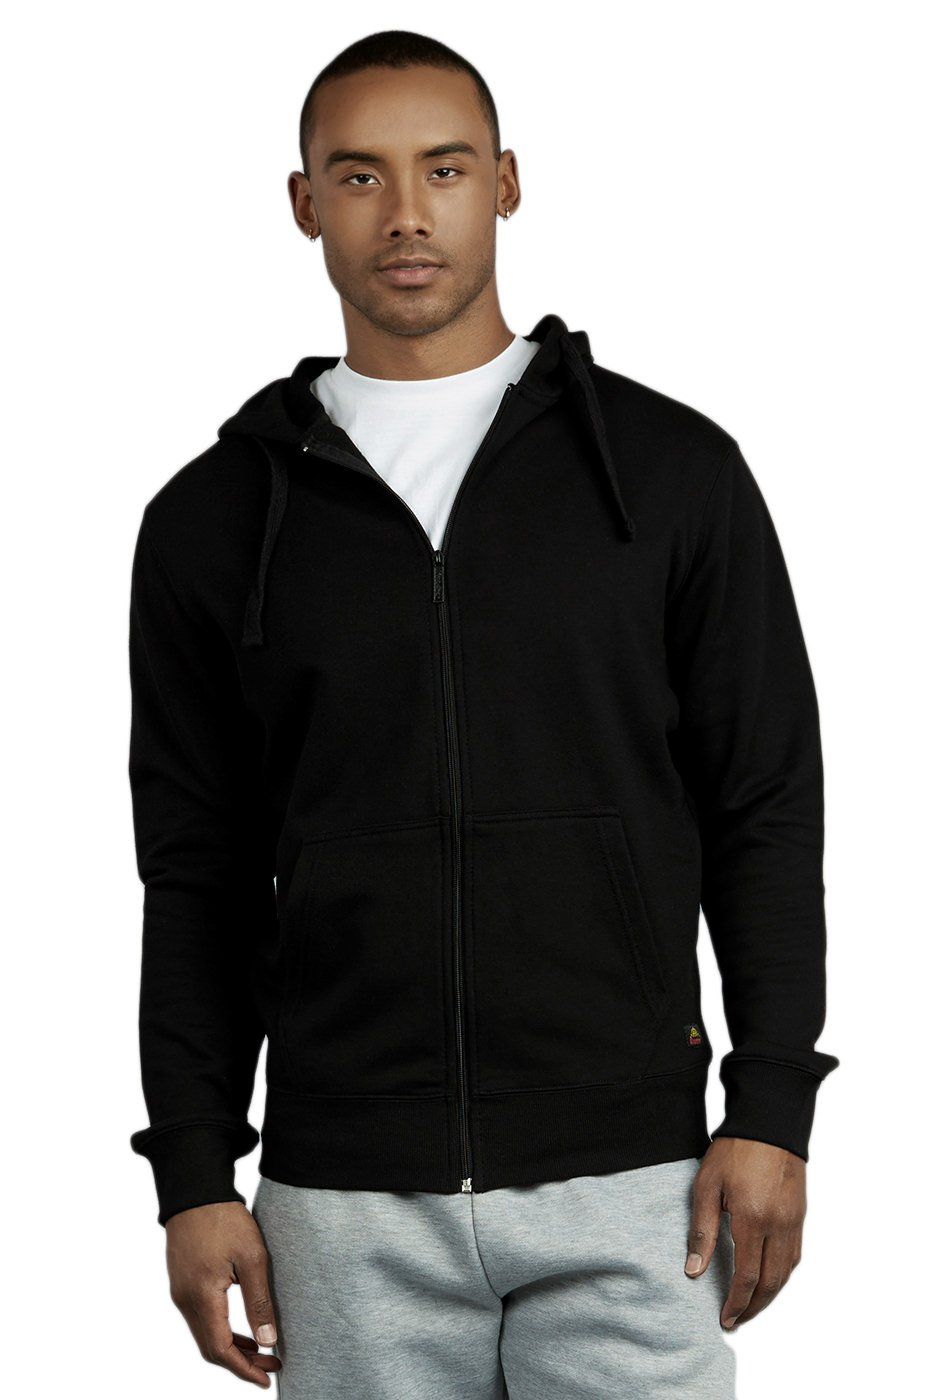 Knocker Men's Terry Fabric Cotton Zip Up Hoodie Jacket (L, Black)